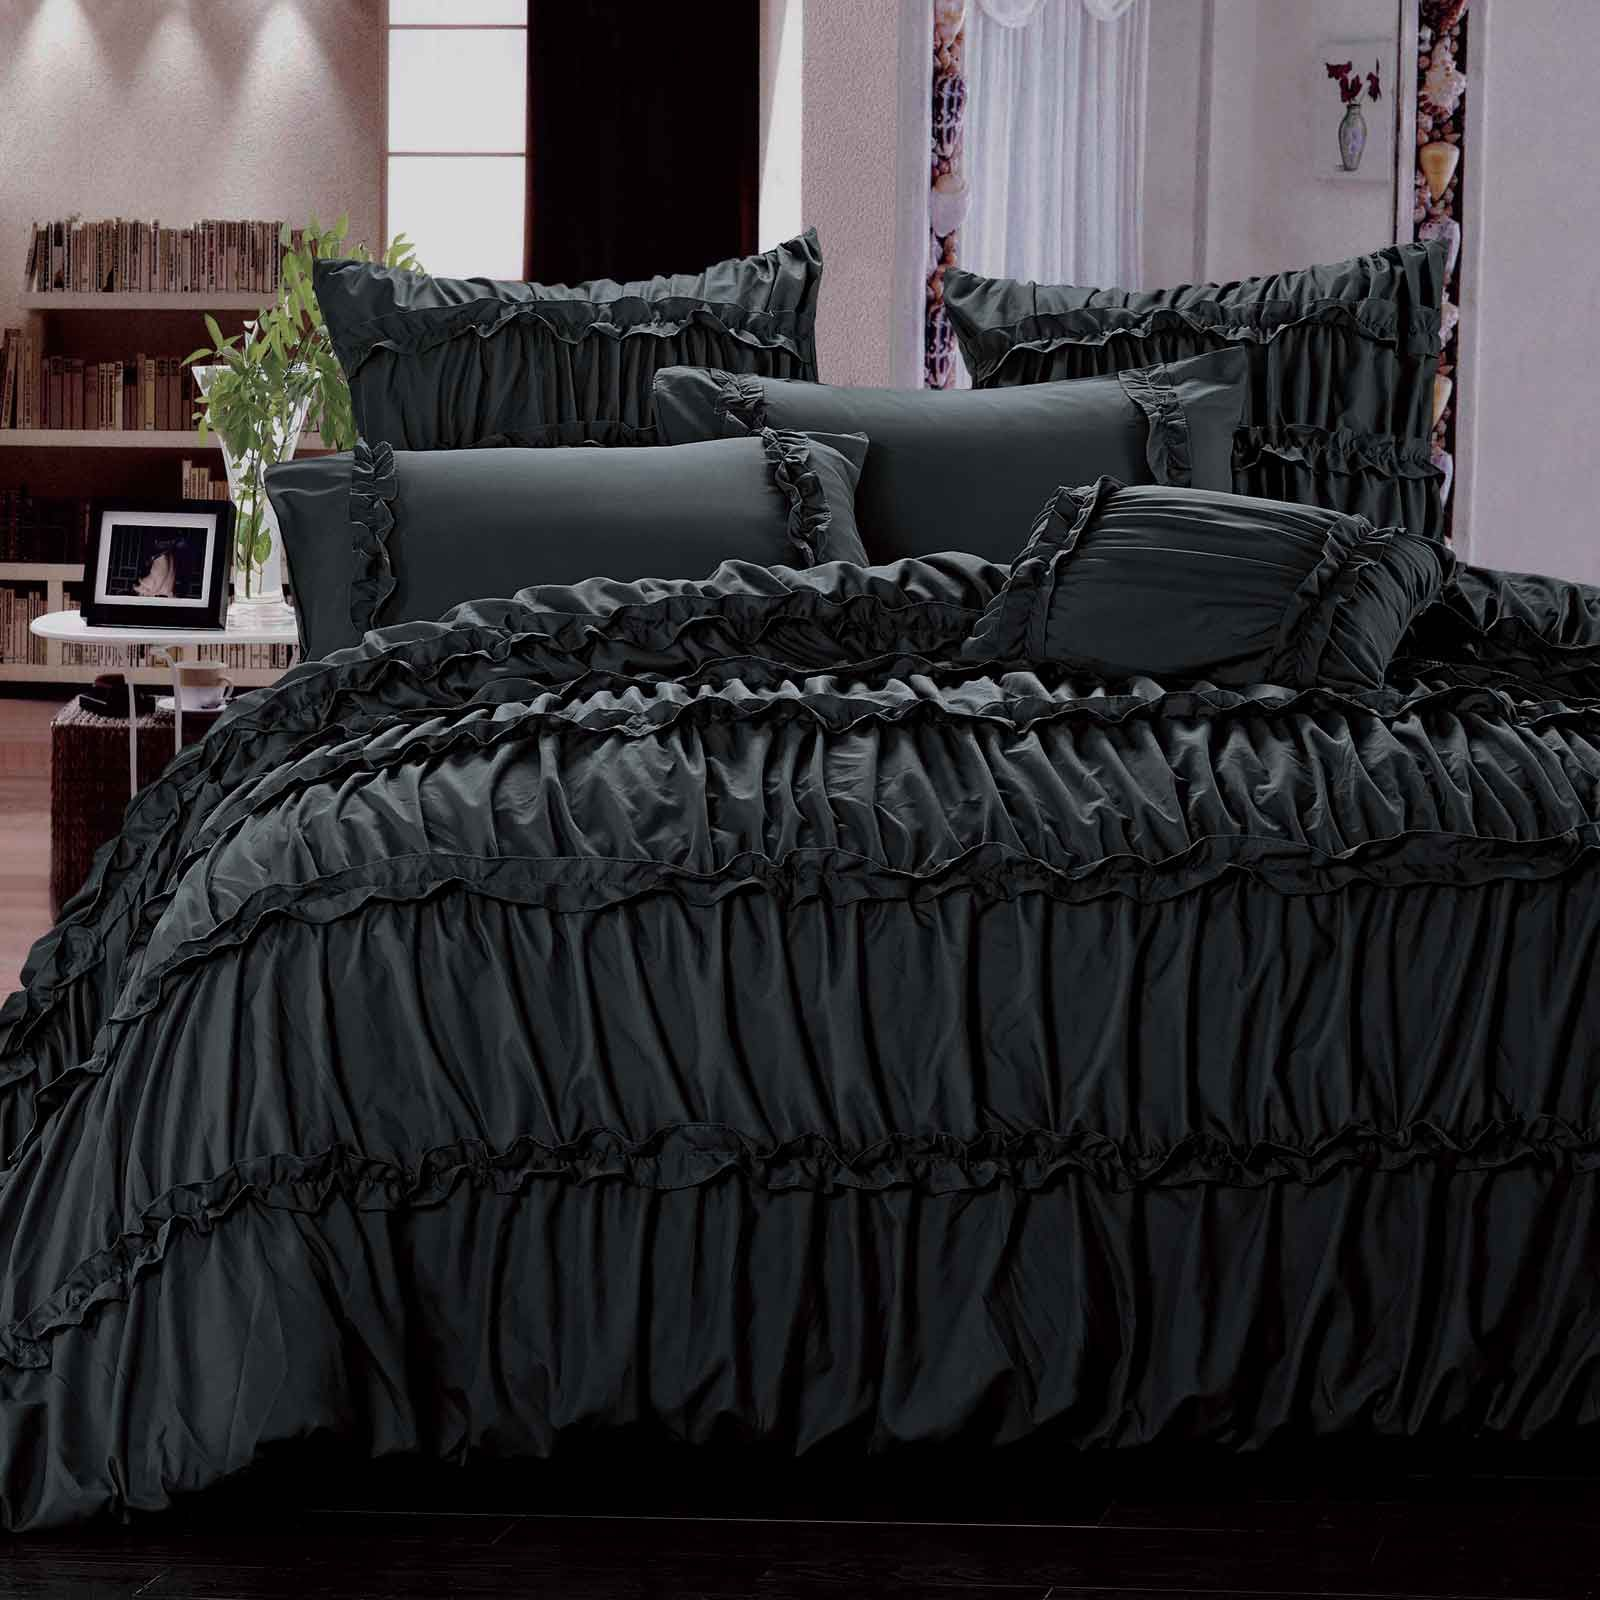 Ruffle Bedding Shabby Chic Set Modern Designs